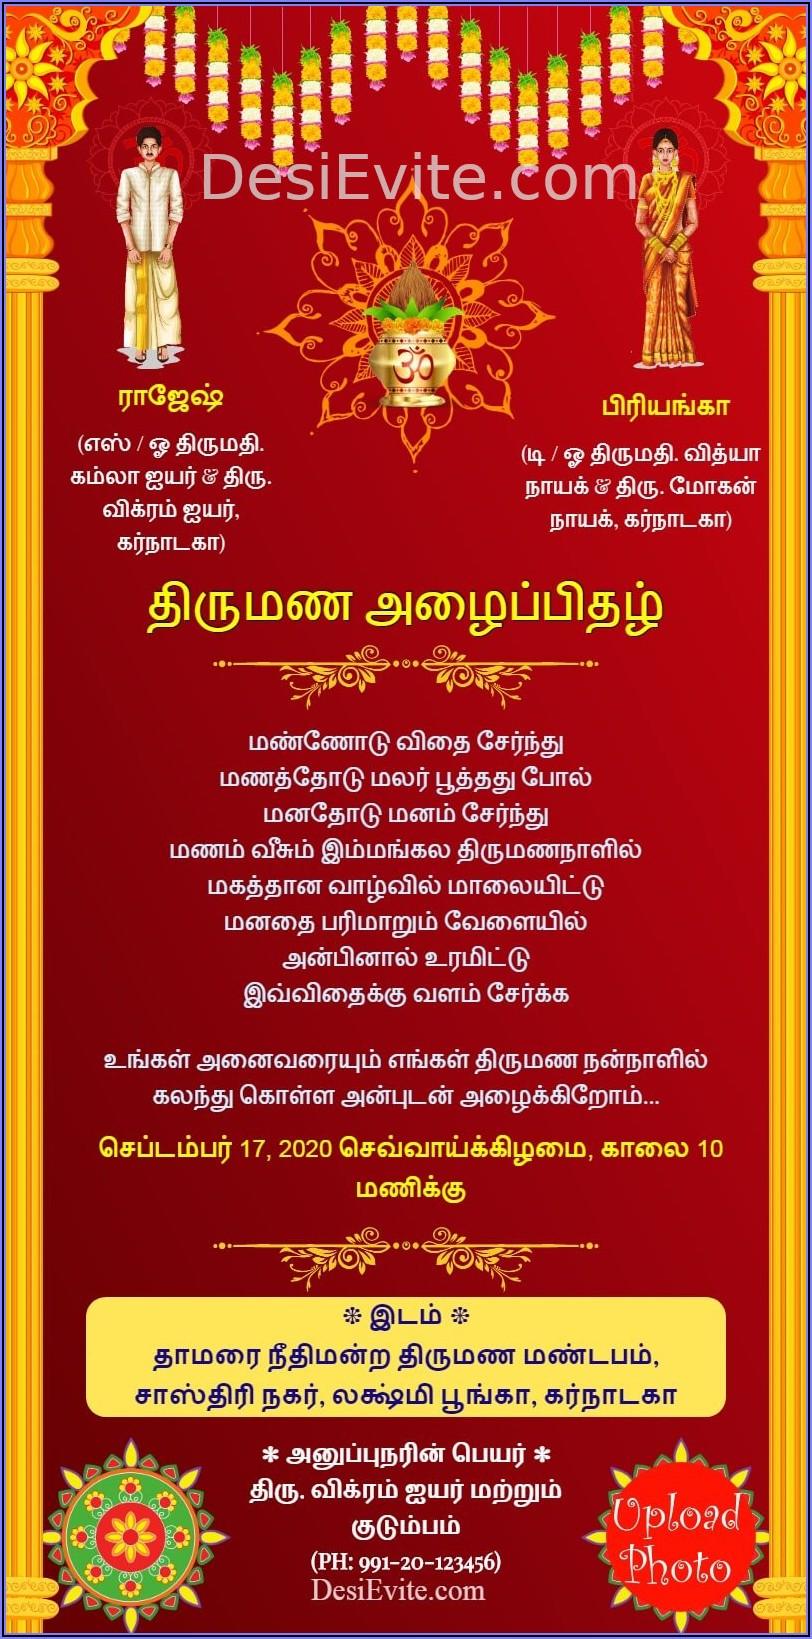 60th Wedding Anniversary Invitation Wording Samples In Tamil